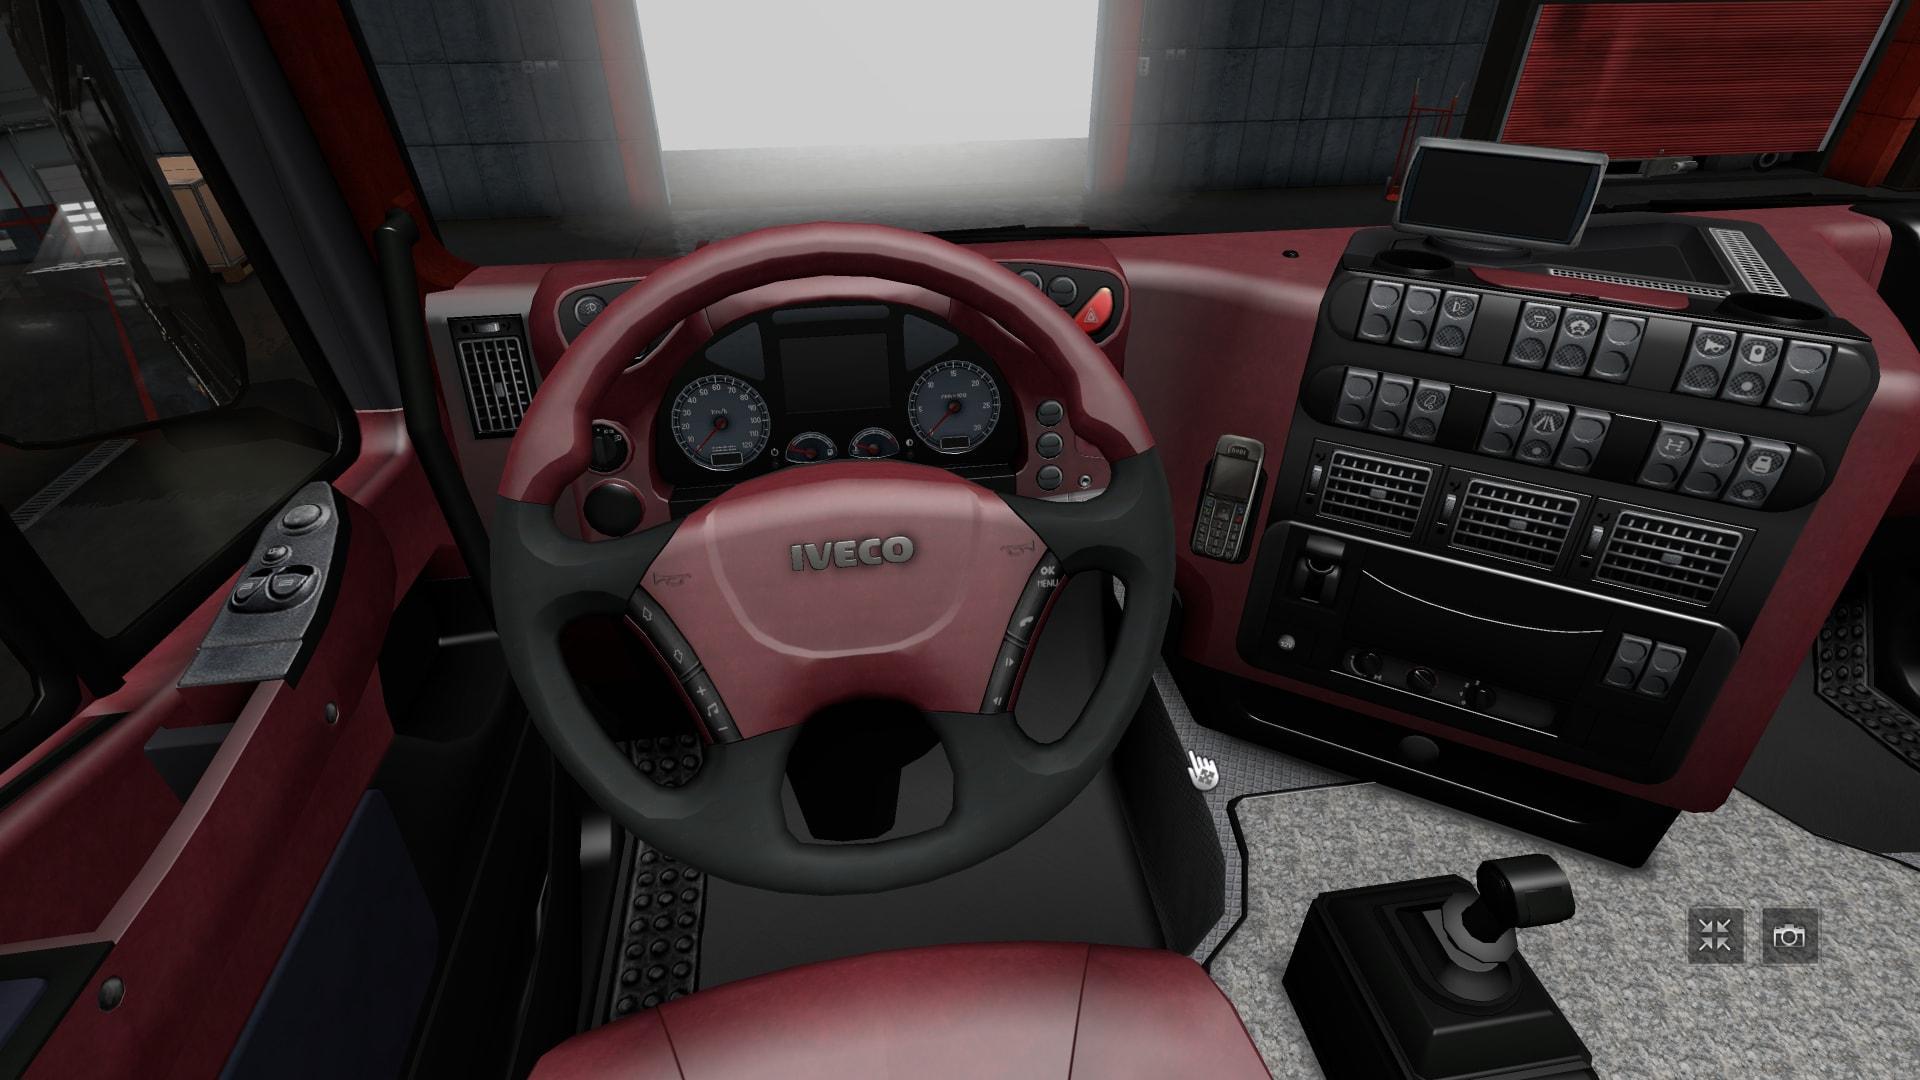 Interiors For Man Tgx And Iveco Stralis V1 Interior Mod